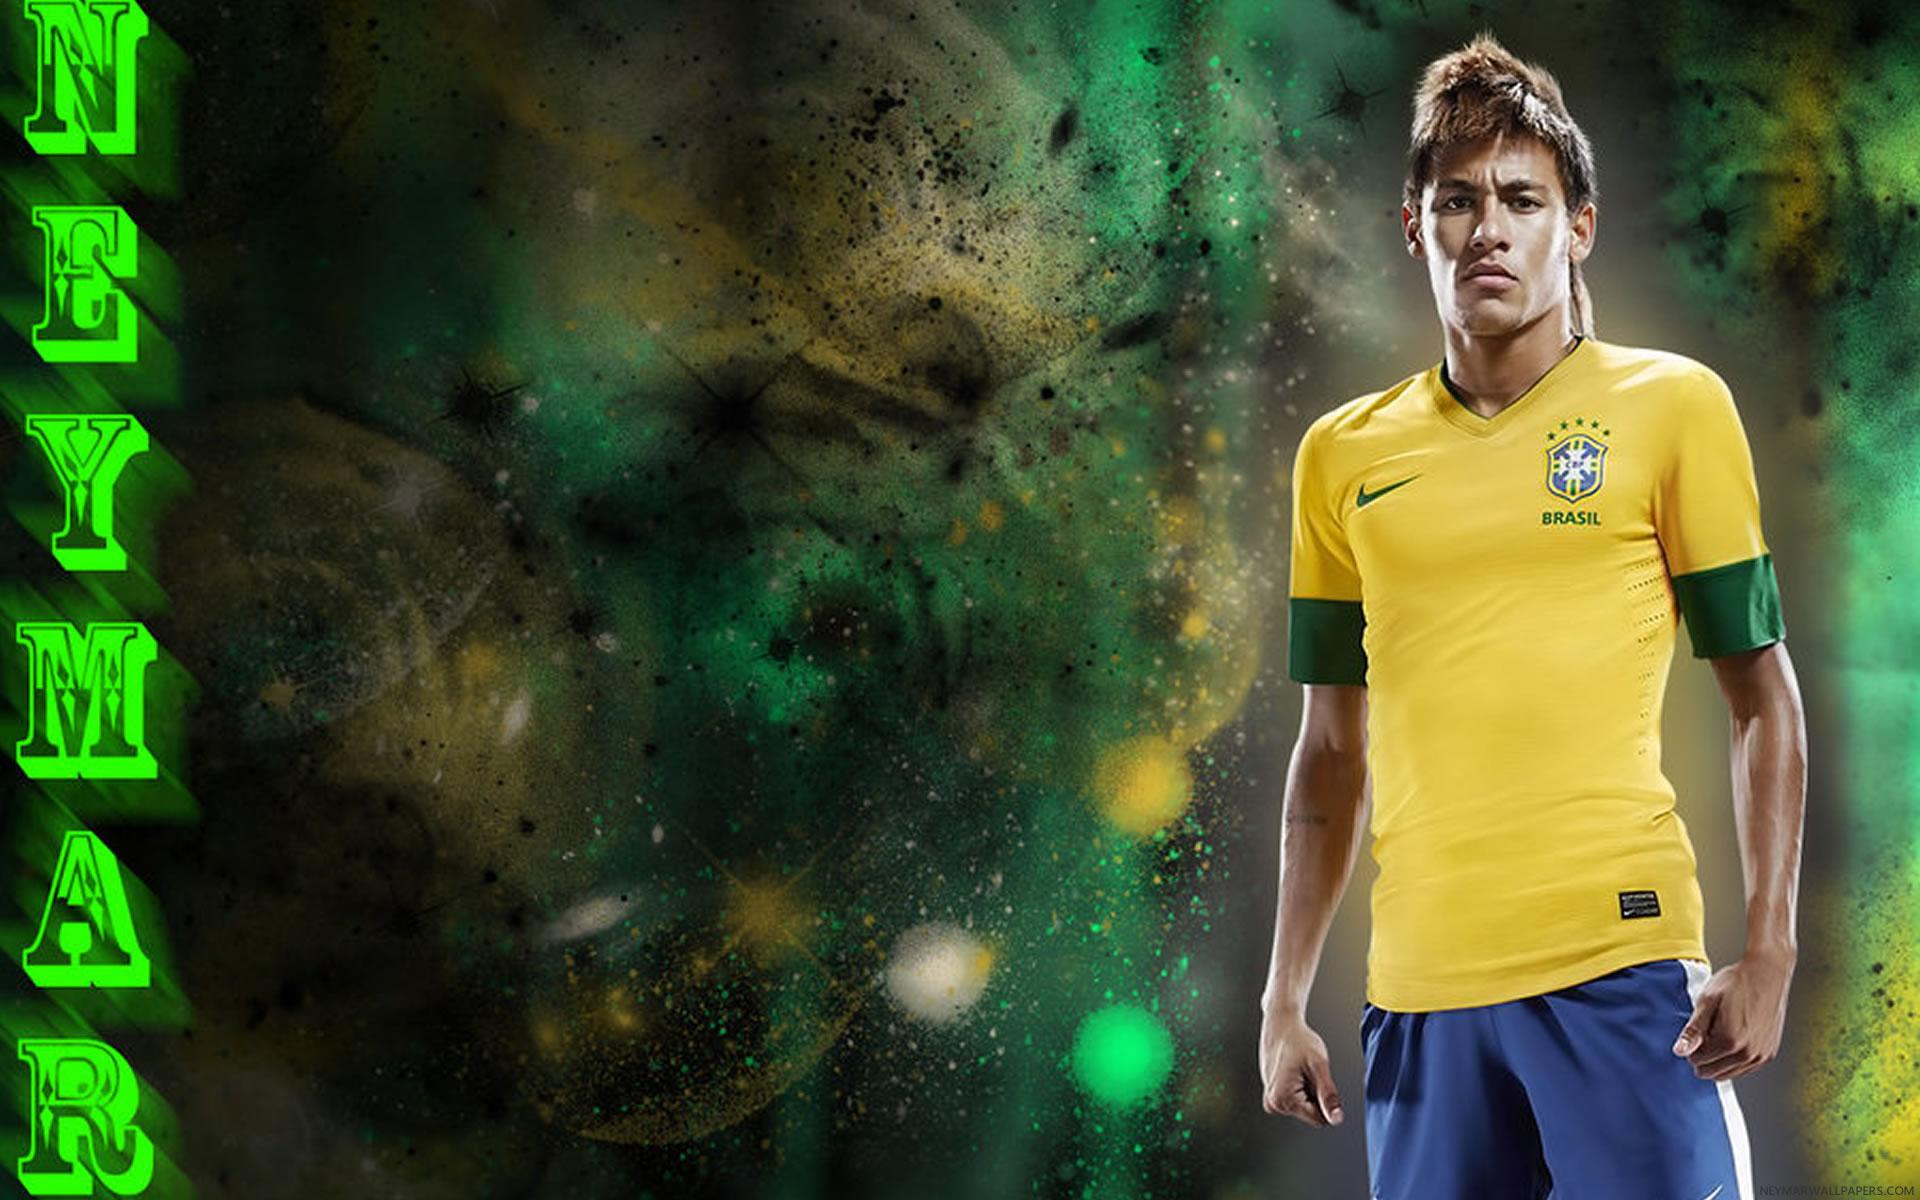 Neymar wallpaper (2)